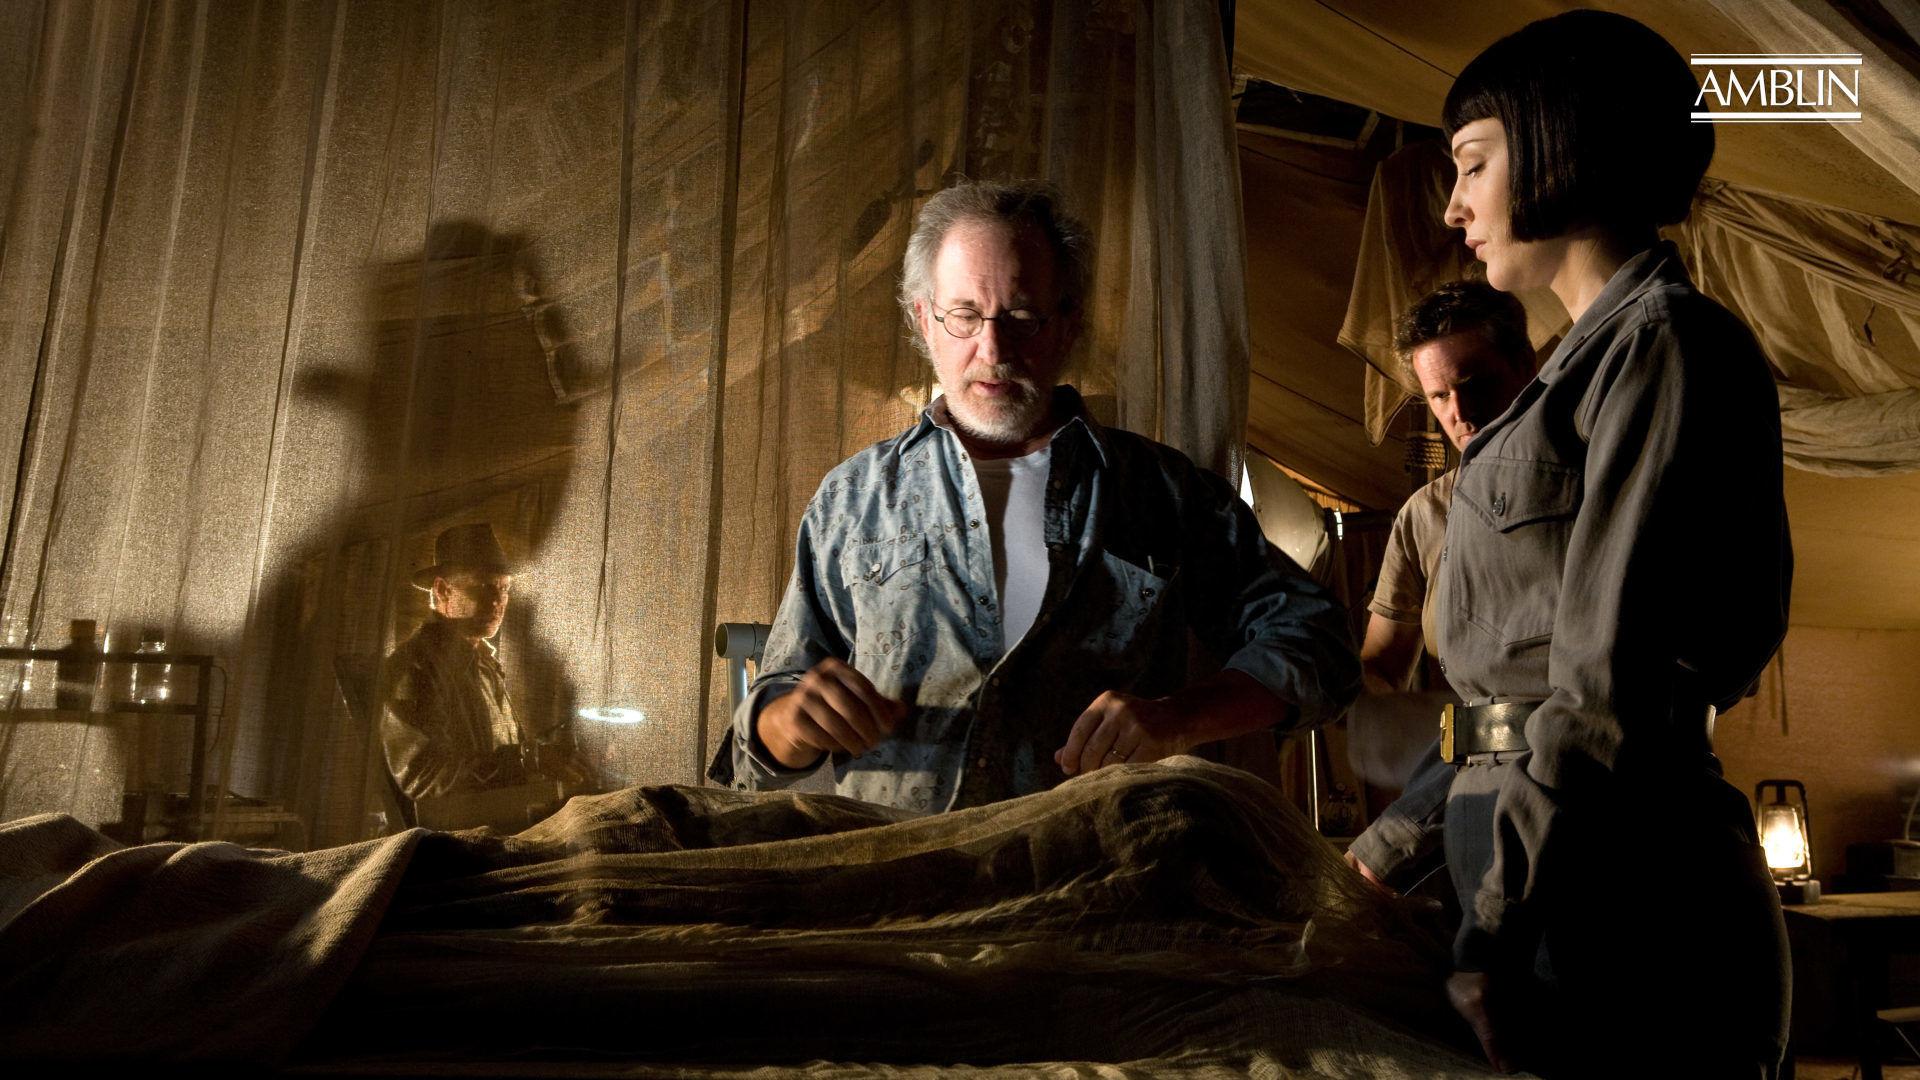 Indiana Jones And The Kingdom Of The Crystal Skull 2008 Steven Spielberg Director Amblin